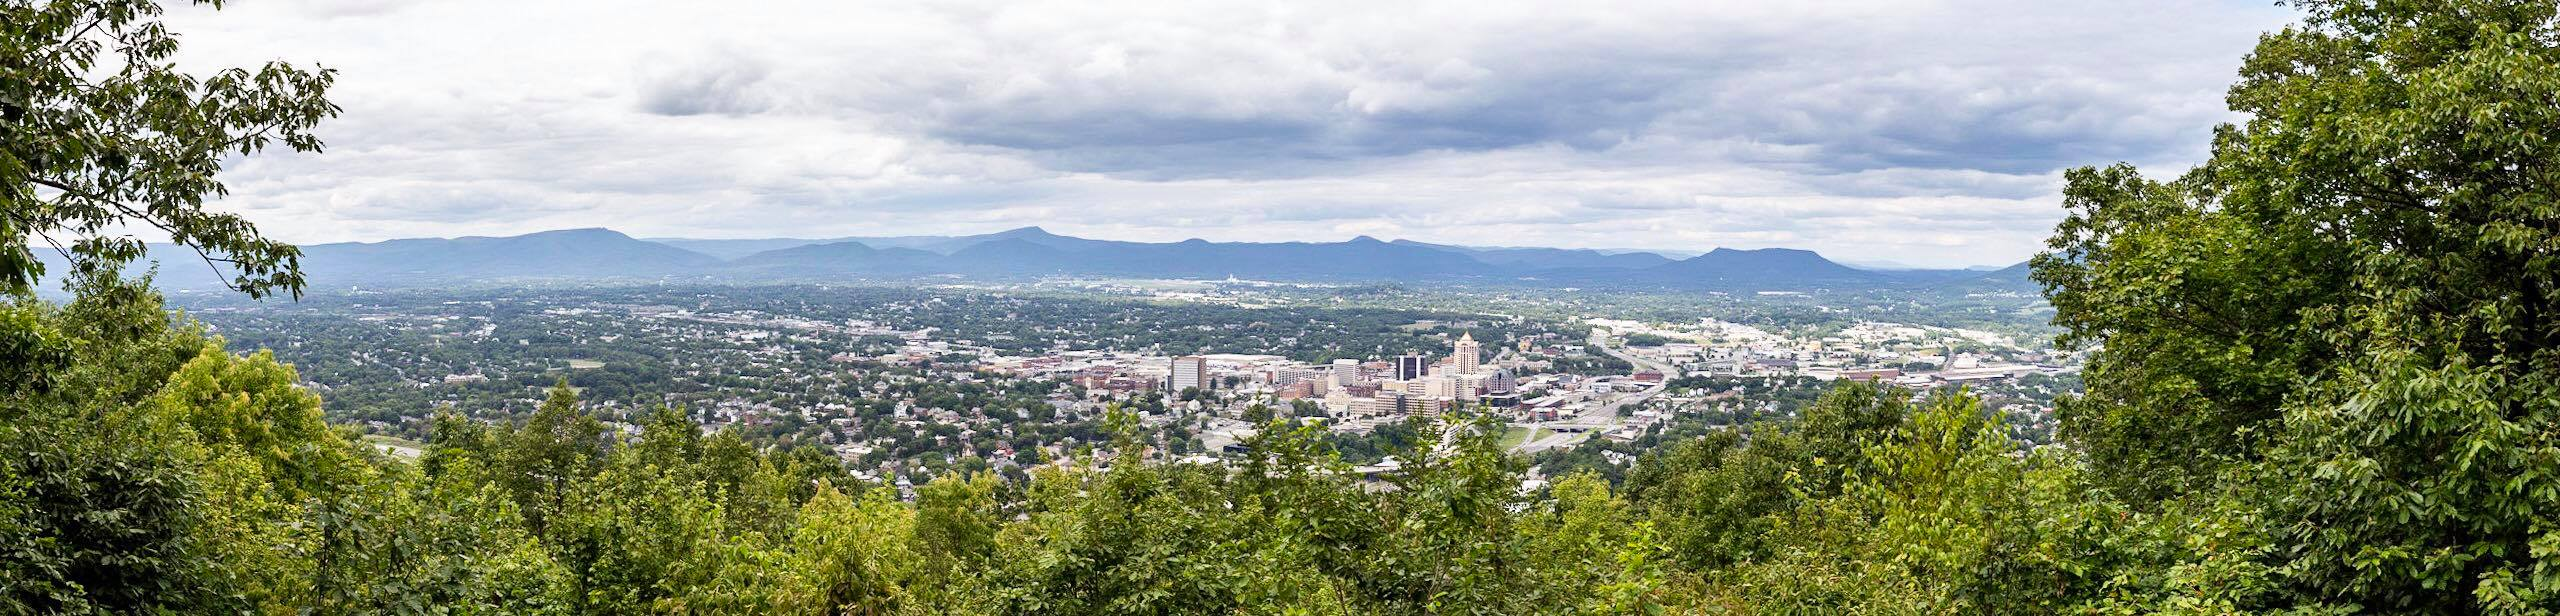 panoramic of Roanoke Va from Mill Mountain